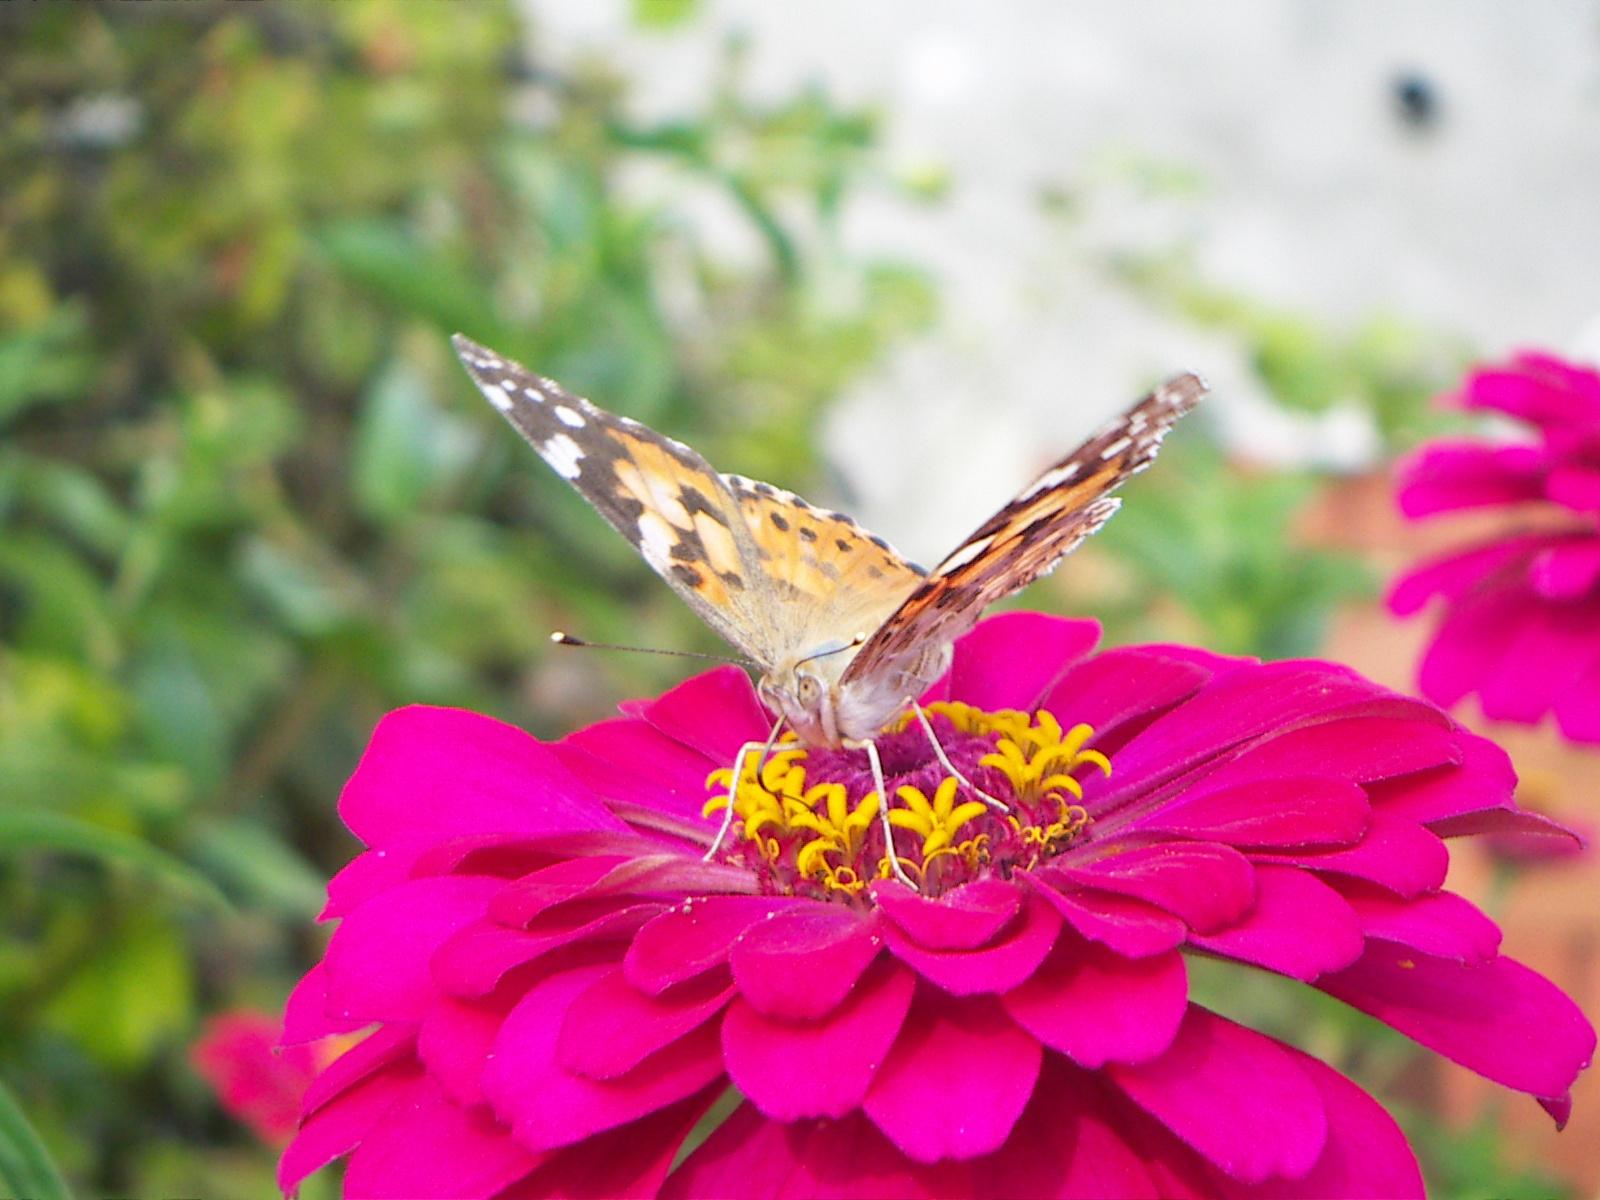 Pillangó egy vasvirágon